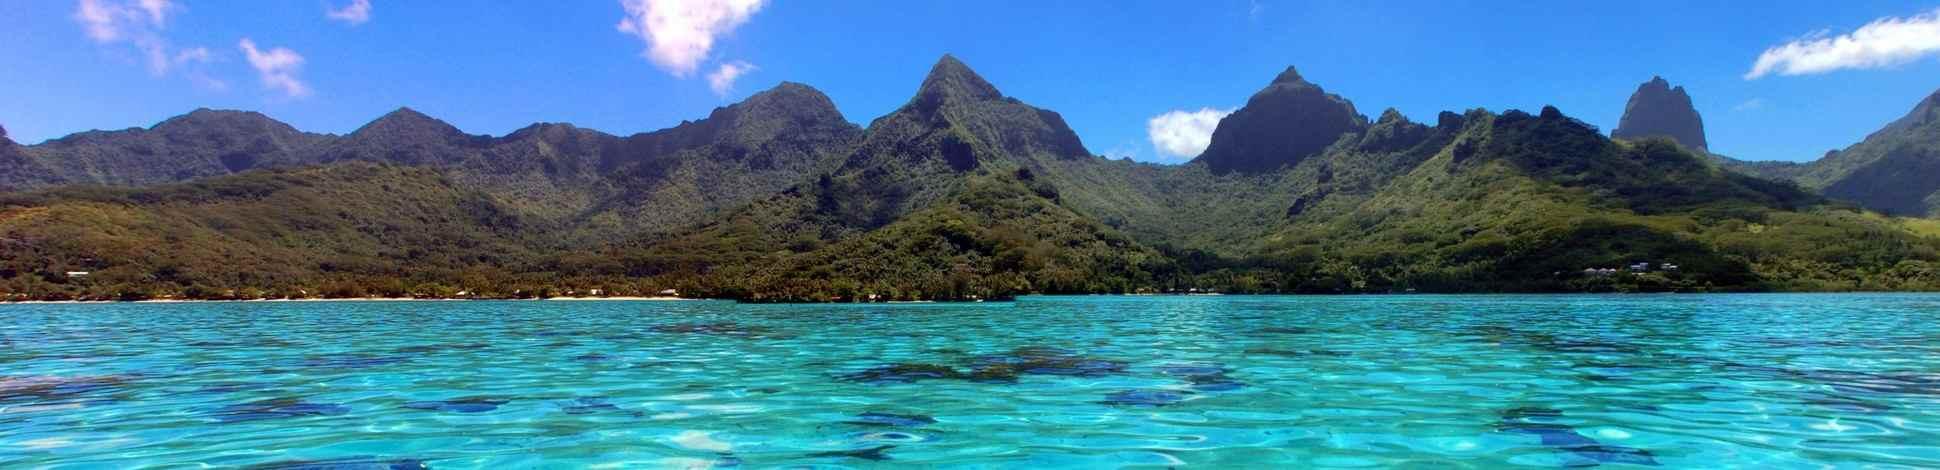 Moorea eau turquoise Polynésie Tahiti - Asie Online